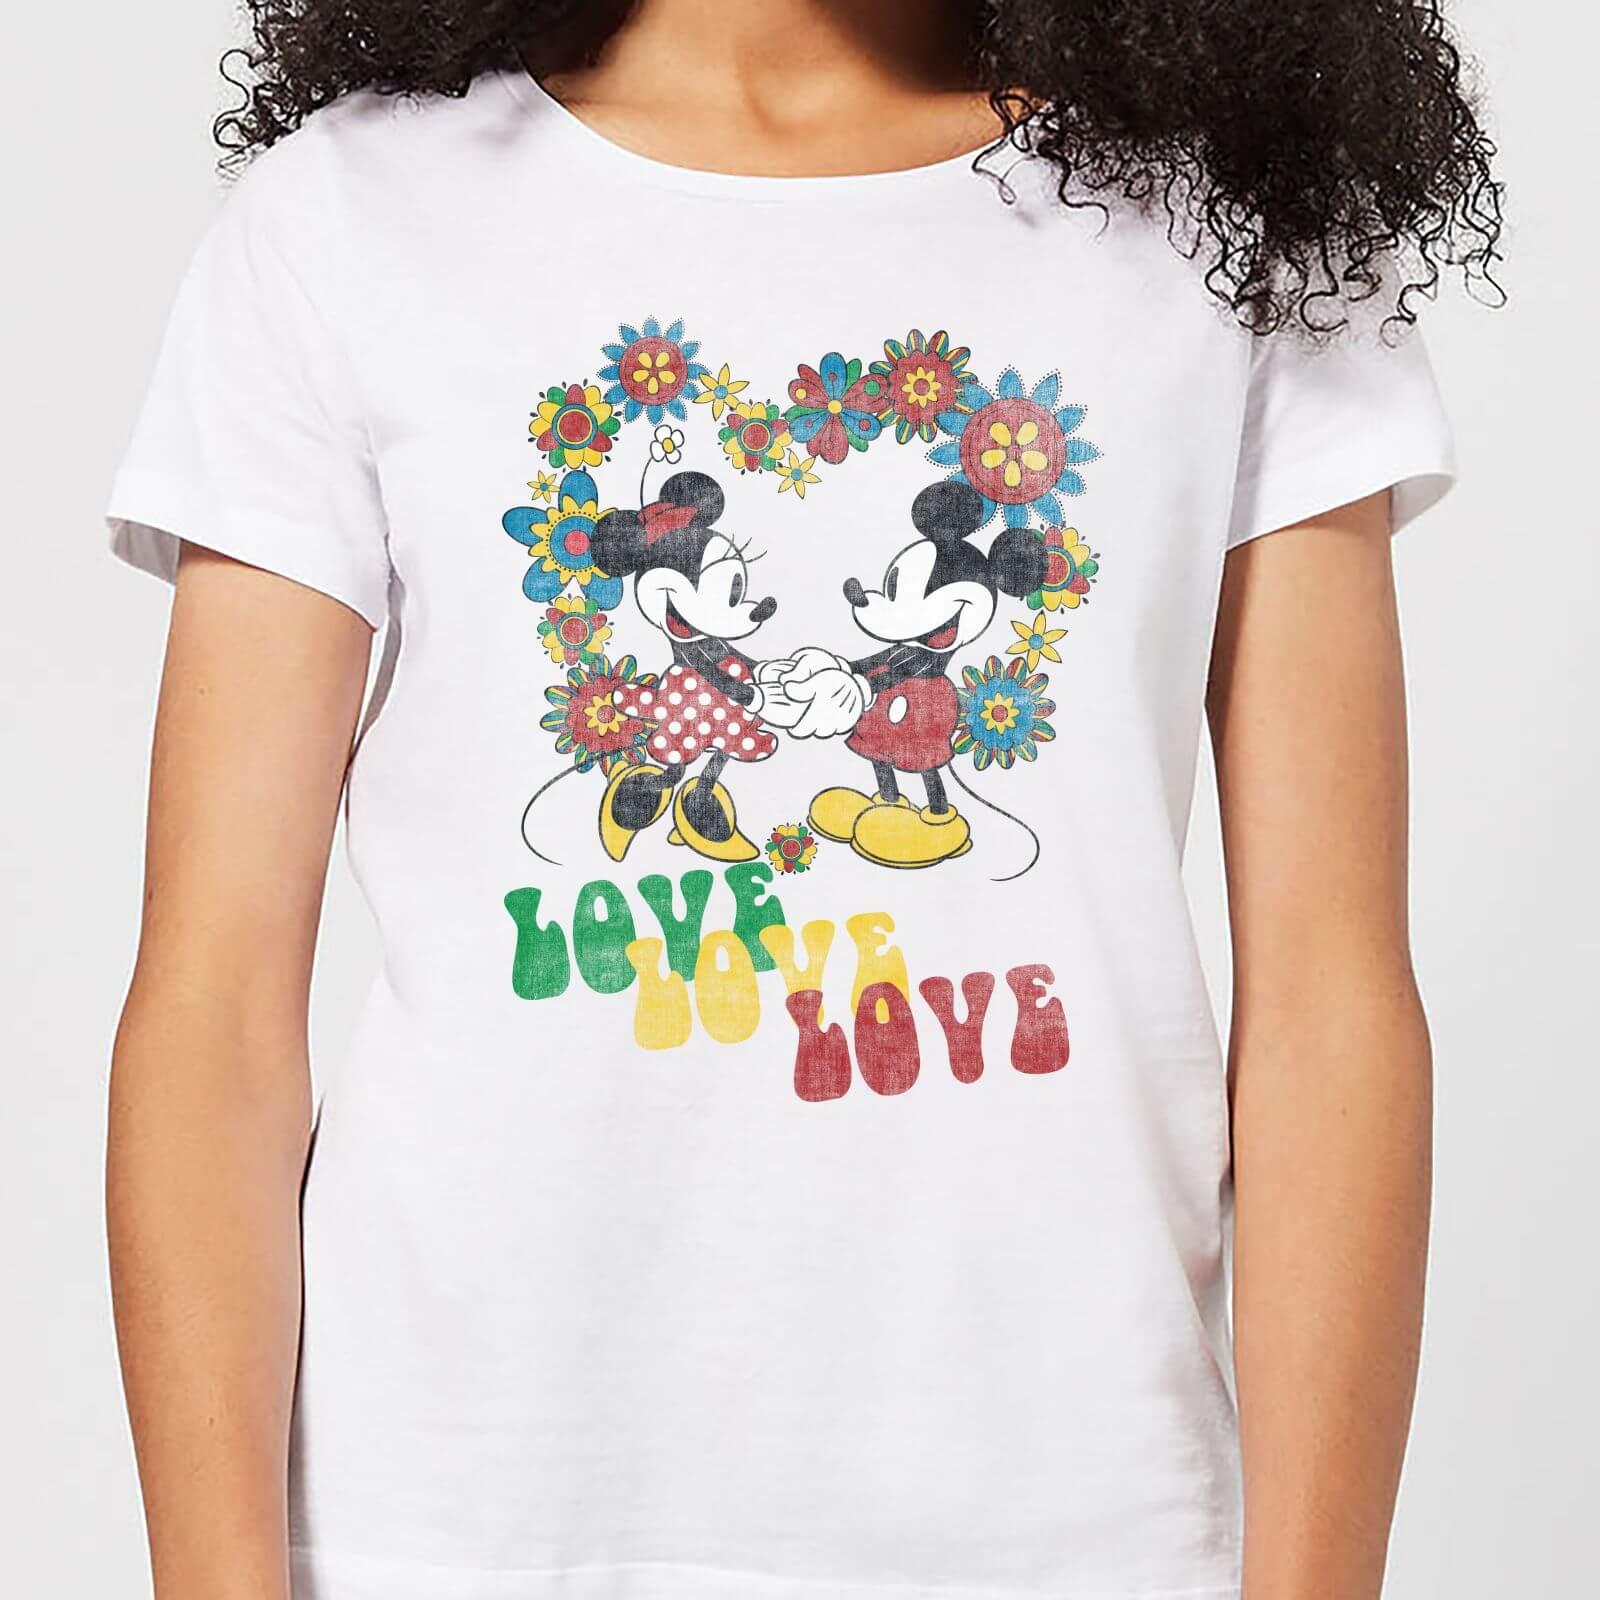 Disney Mickey Mouse Hippie Love Women's T-Shirt - White - M - White